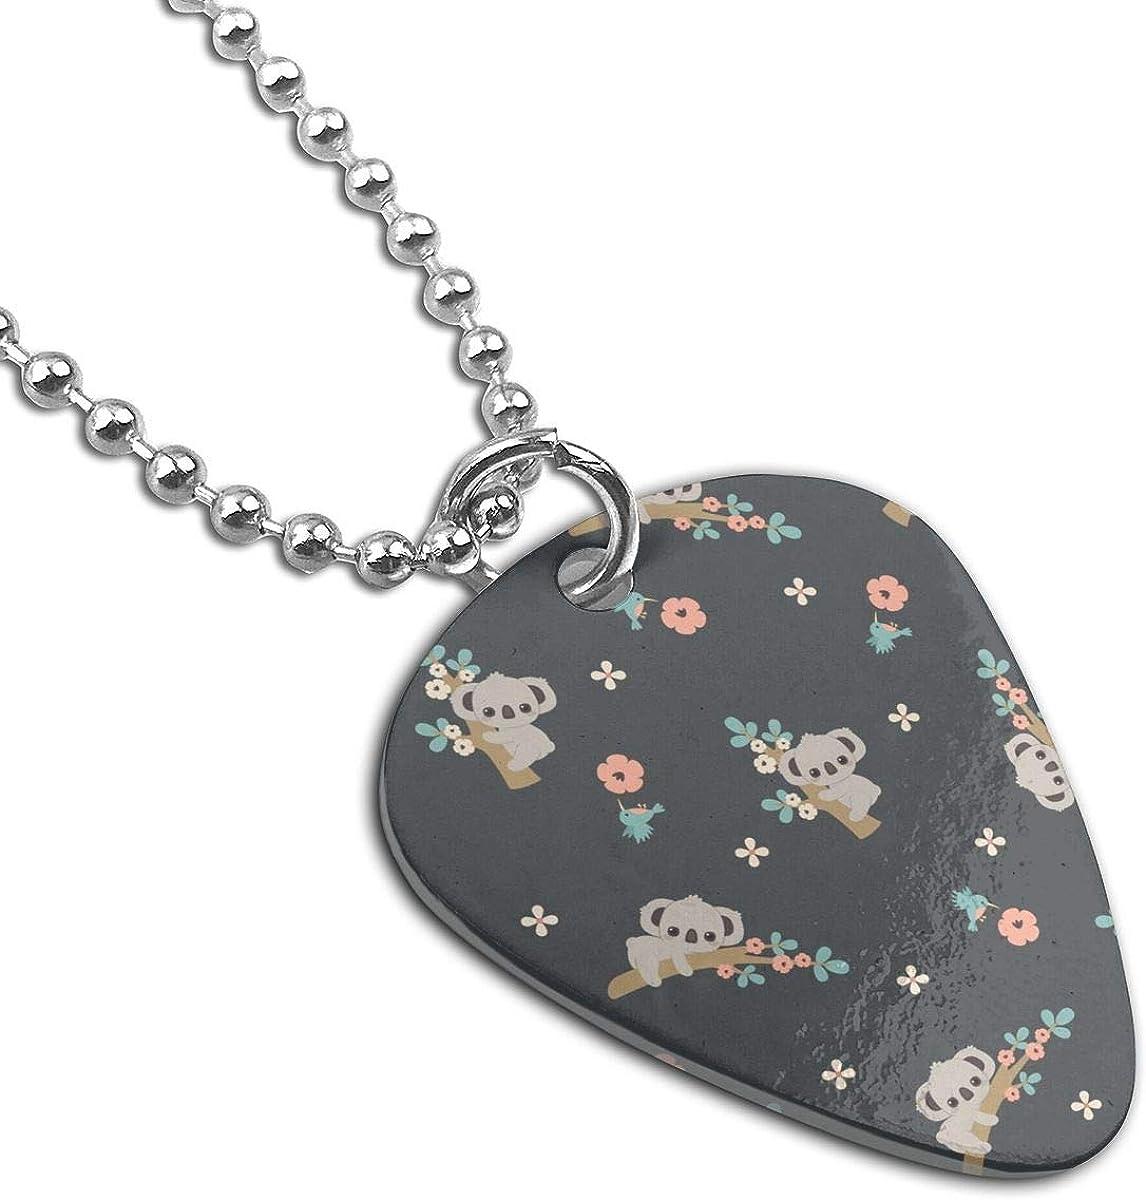 Cartoon Koala Floral Custom Guitar Pick Pendant Necklace Keychain